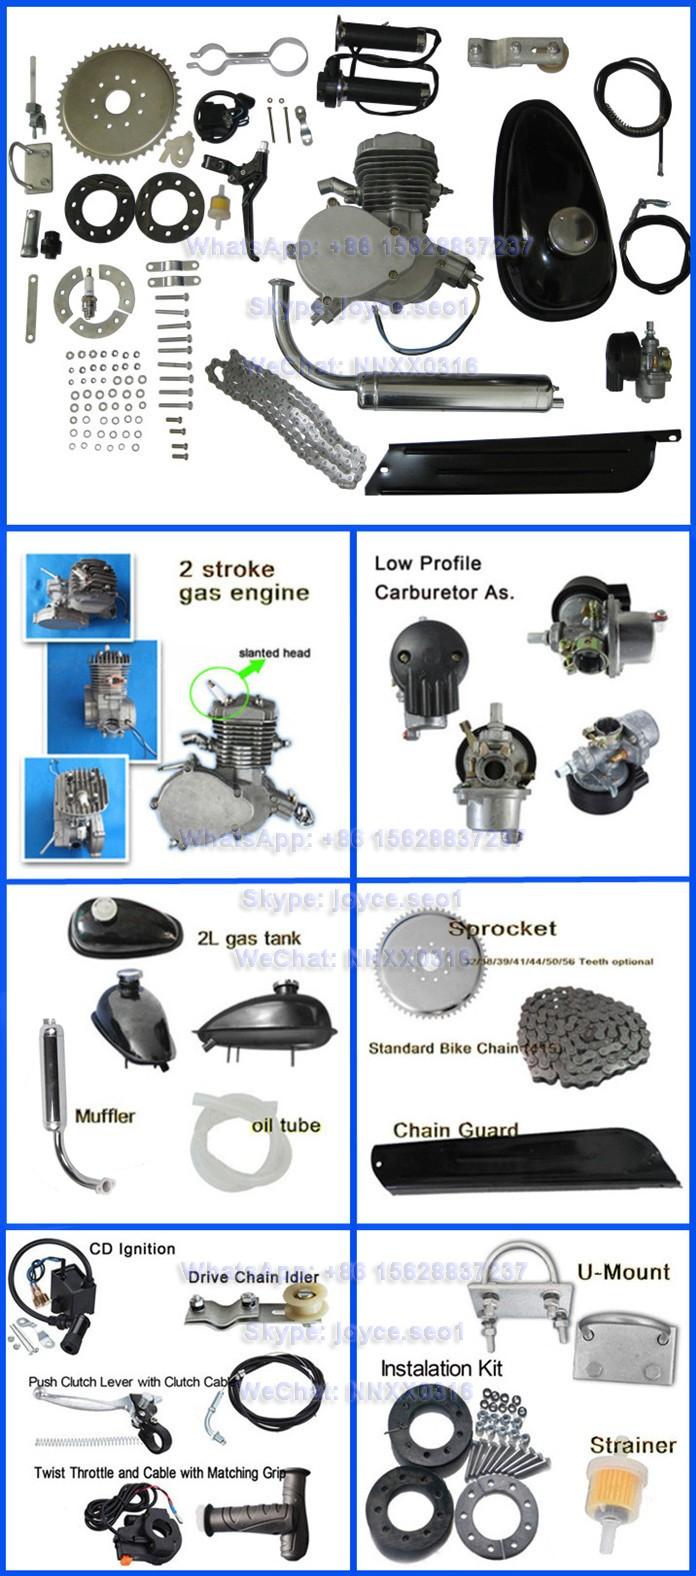 hight resolution of kick start 48cc 49cc 50cc 60cc 66cc f80 80 cc 2 stroke bike gasoline bicycle motor